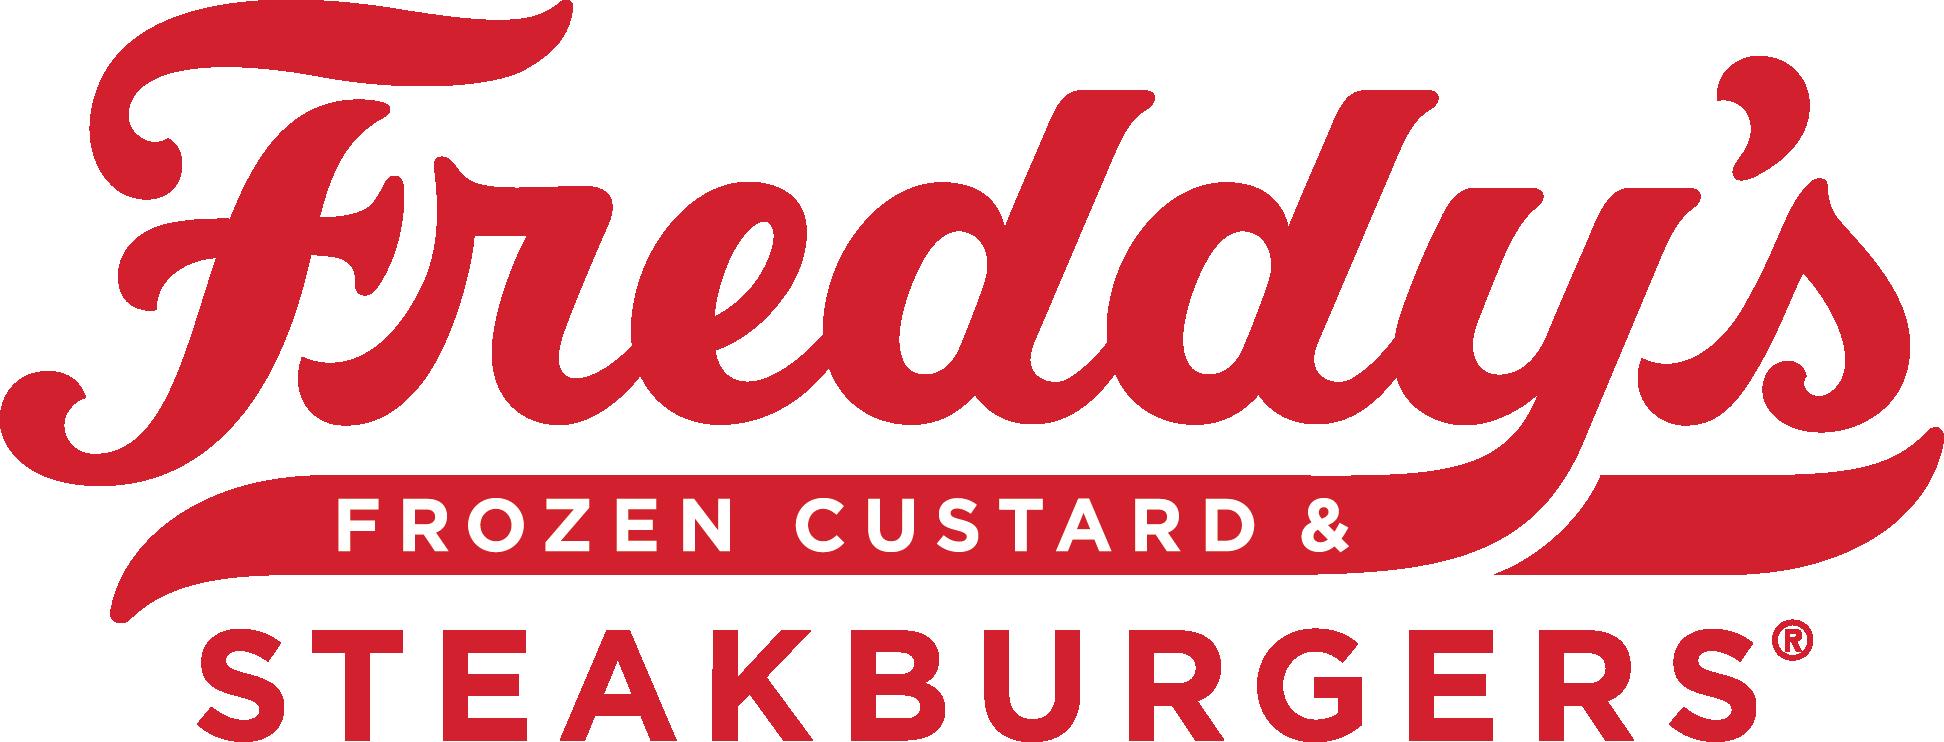 Freddy's Primary Script Logo